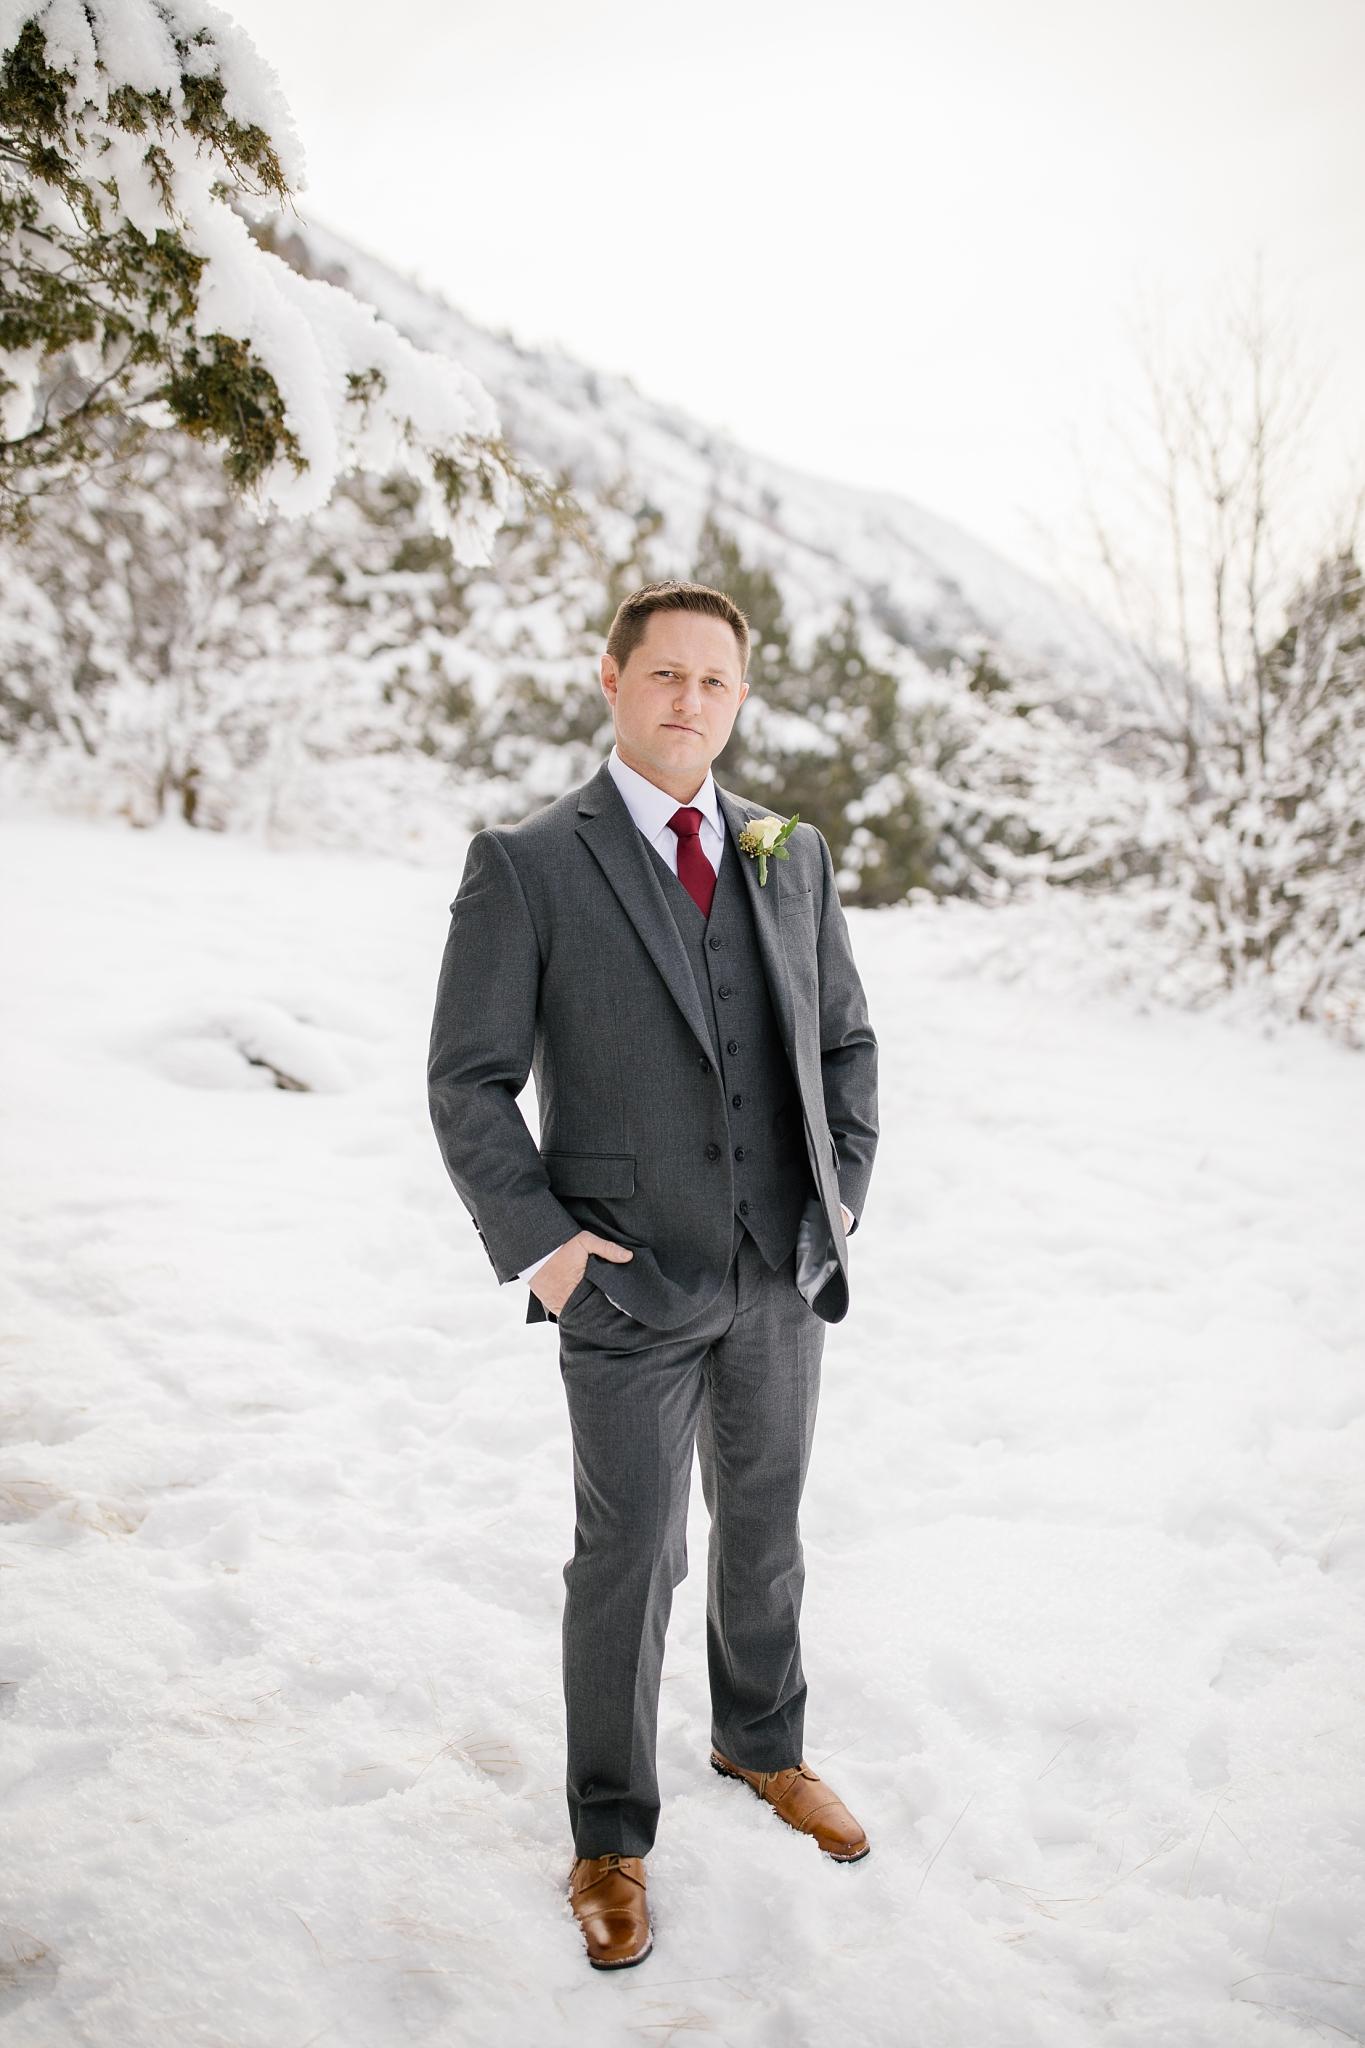 SSBridals-2_Lizzie-B-Imagery-Utah-Wedding-Photographer-Logan-Temple-Logan-Canyon-Mountain-Horse-Session.jpg